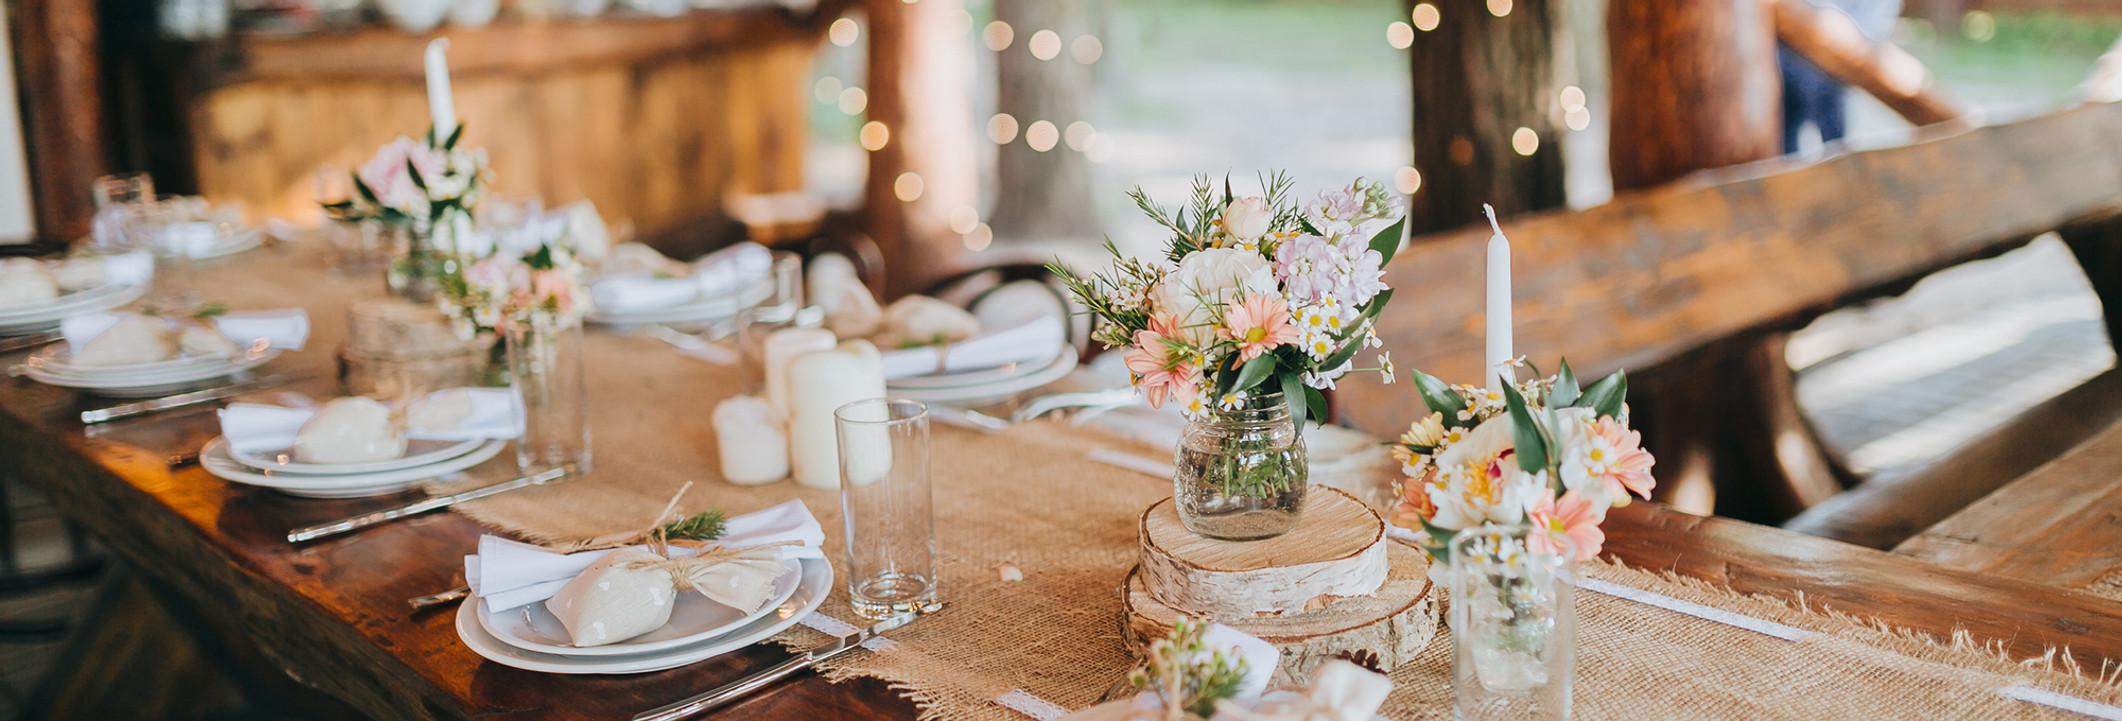 Rustic Table Arrangement